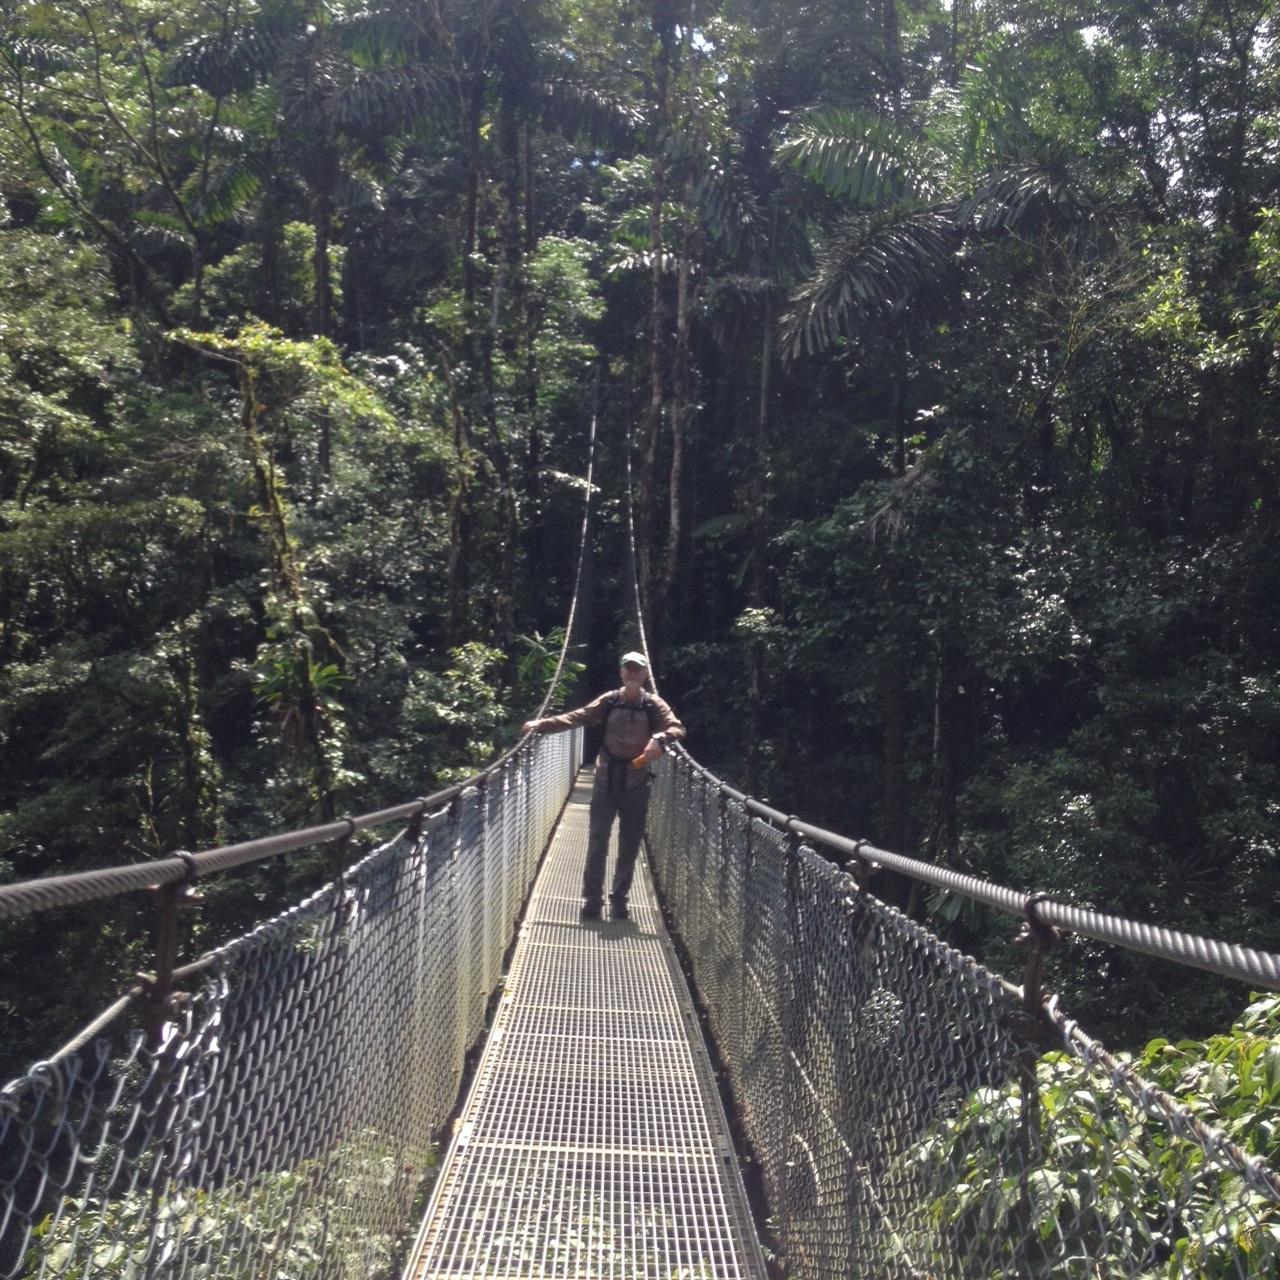 Michael on one of the six suspension bridges